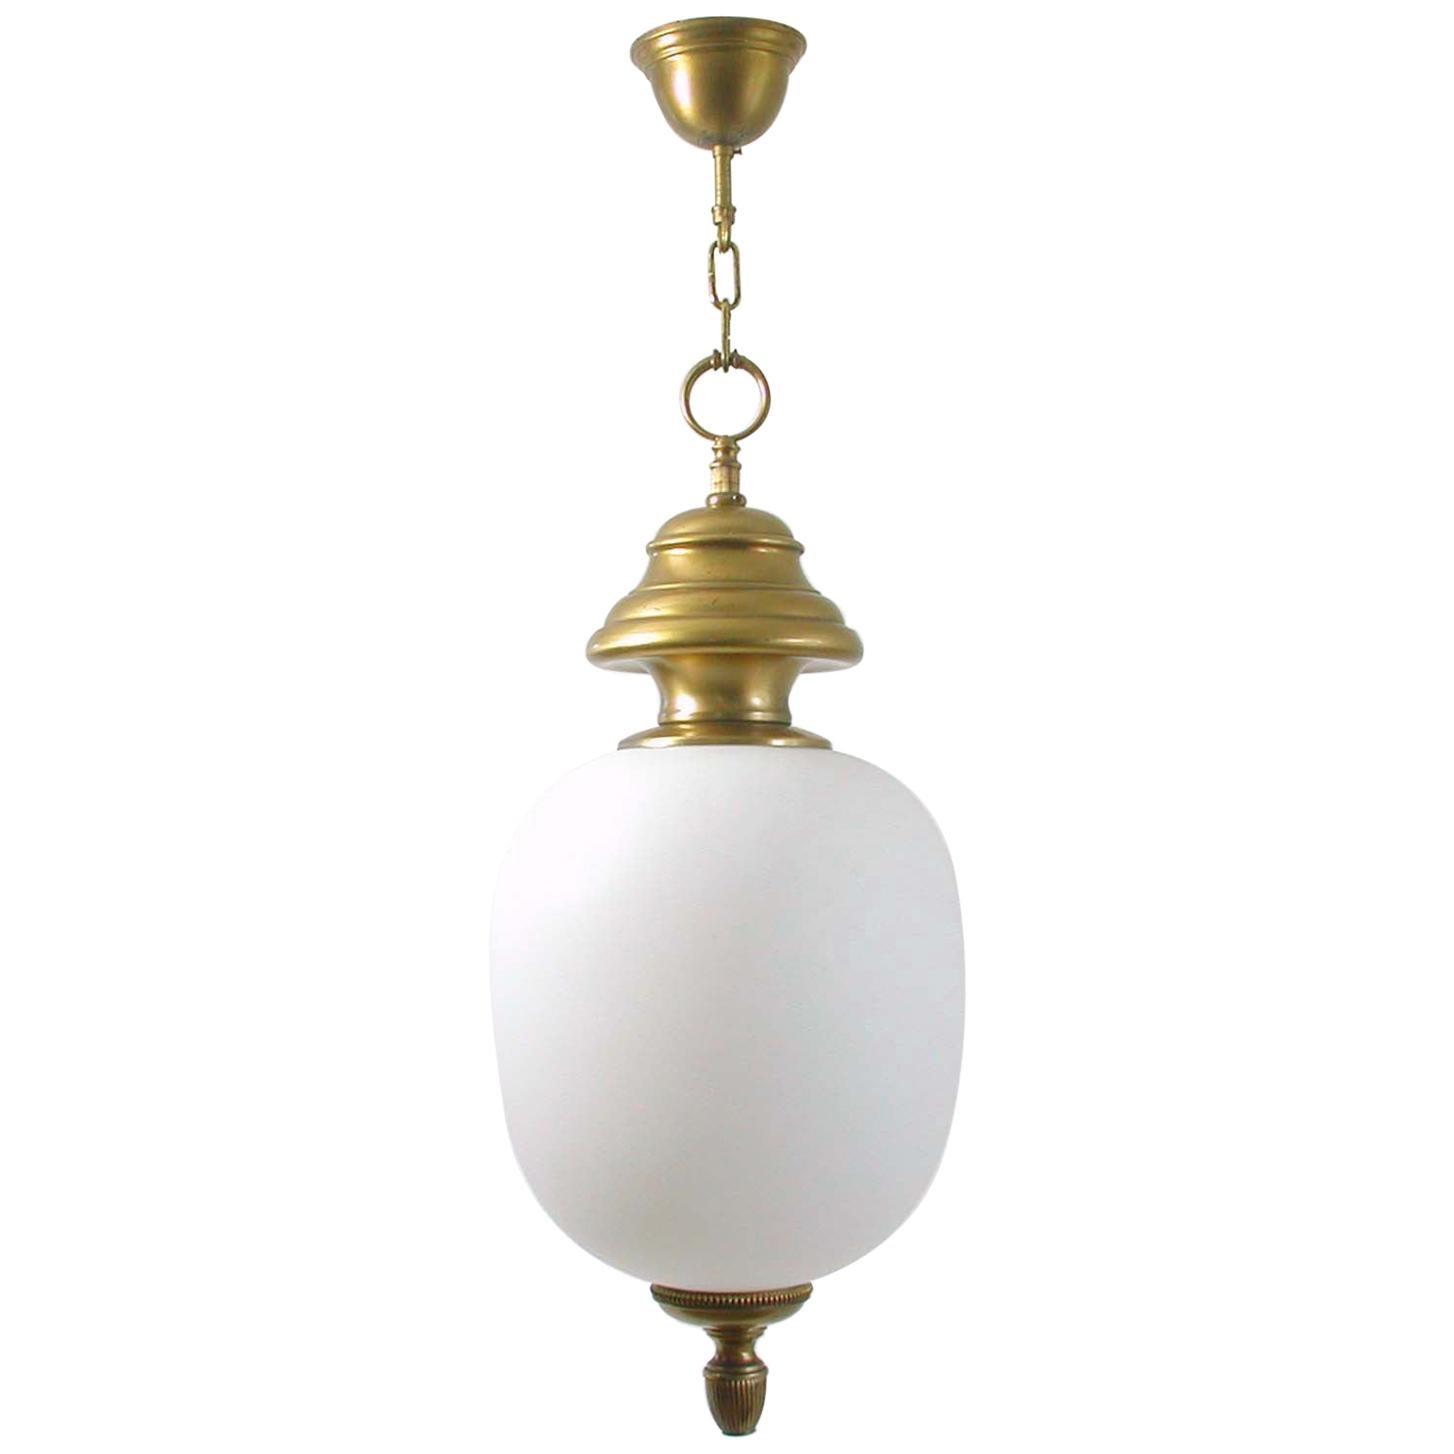 1950s Italian Brass and Satin Opaline Glass Pendant by Azucena